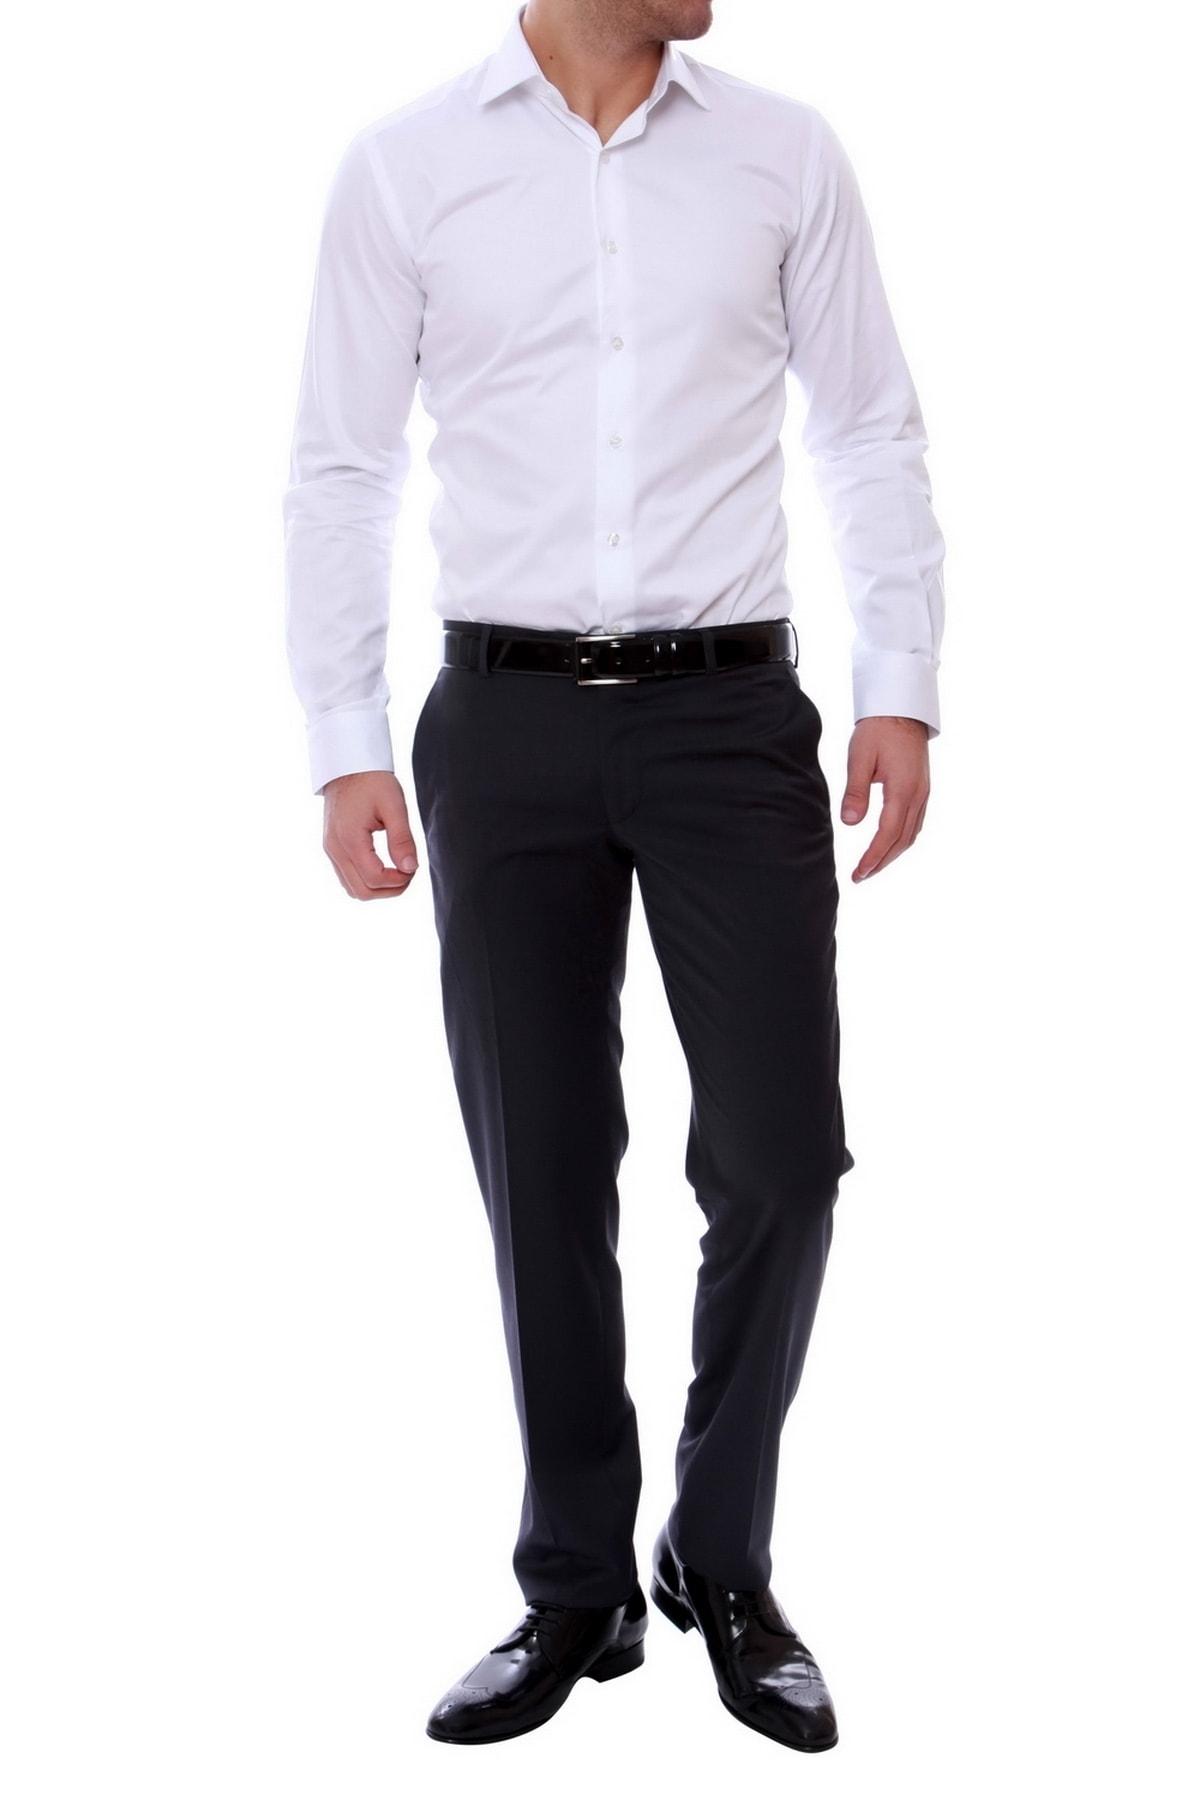 Efor P 888 Slim Fit Antrasit Klasik Pantolon 1